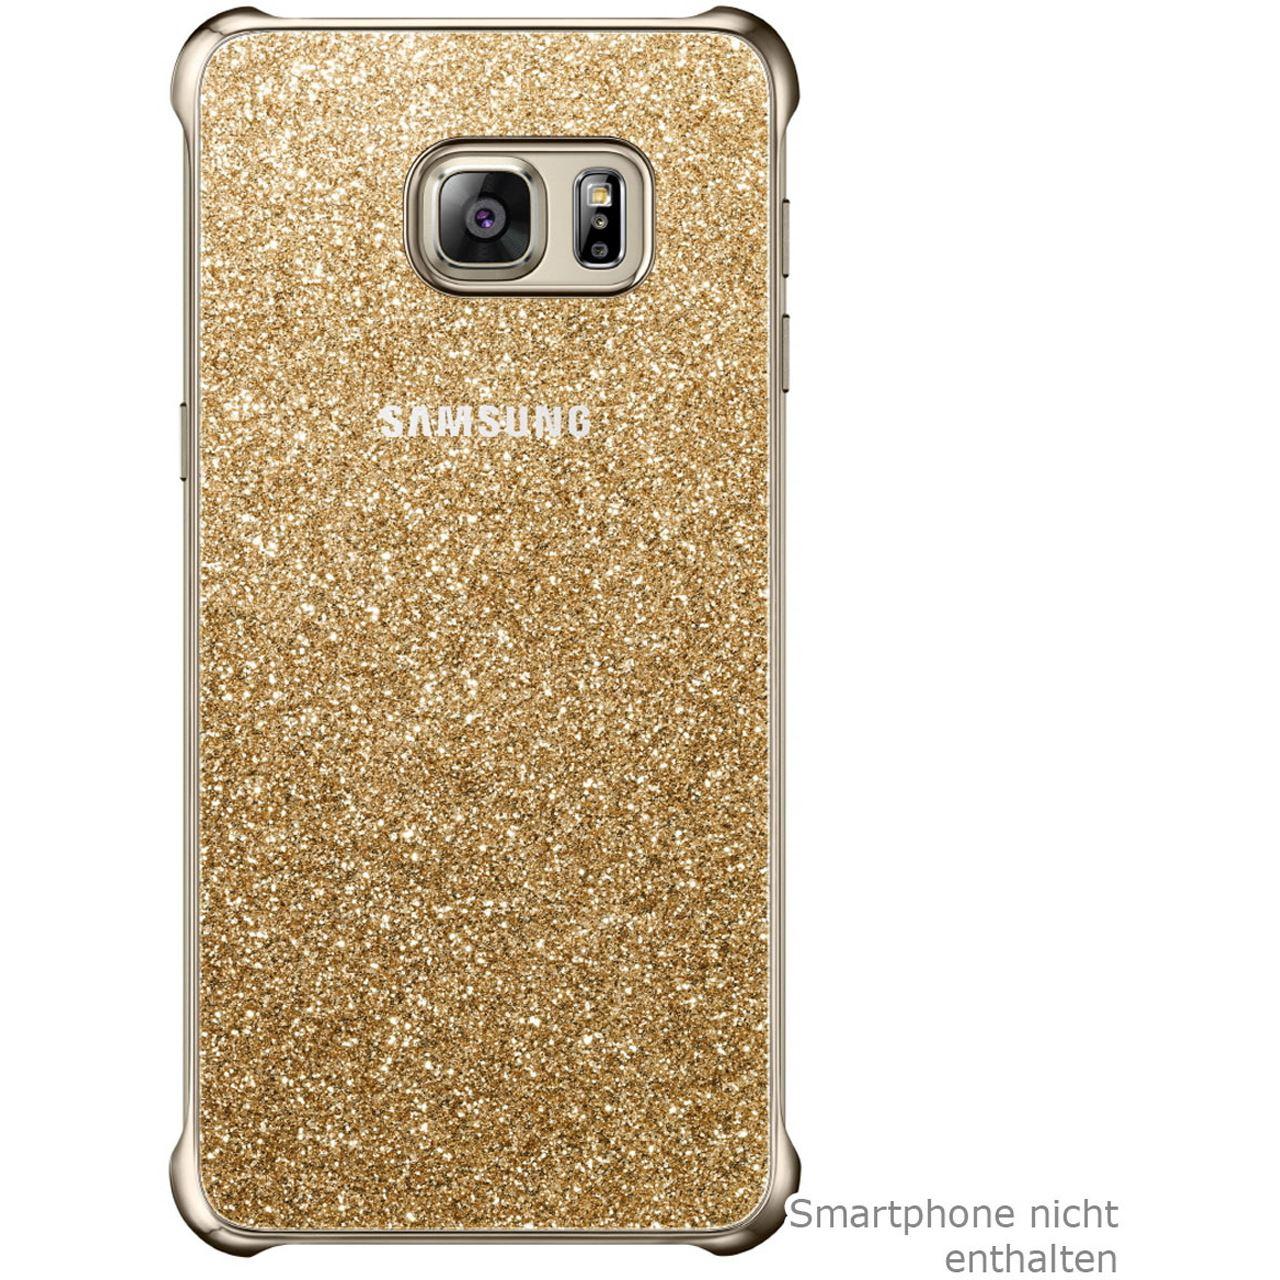 samsung glitter cover g928f galaxy s6 edge gold. Black Bedroom Furniture Sets. Home Design Ideas